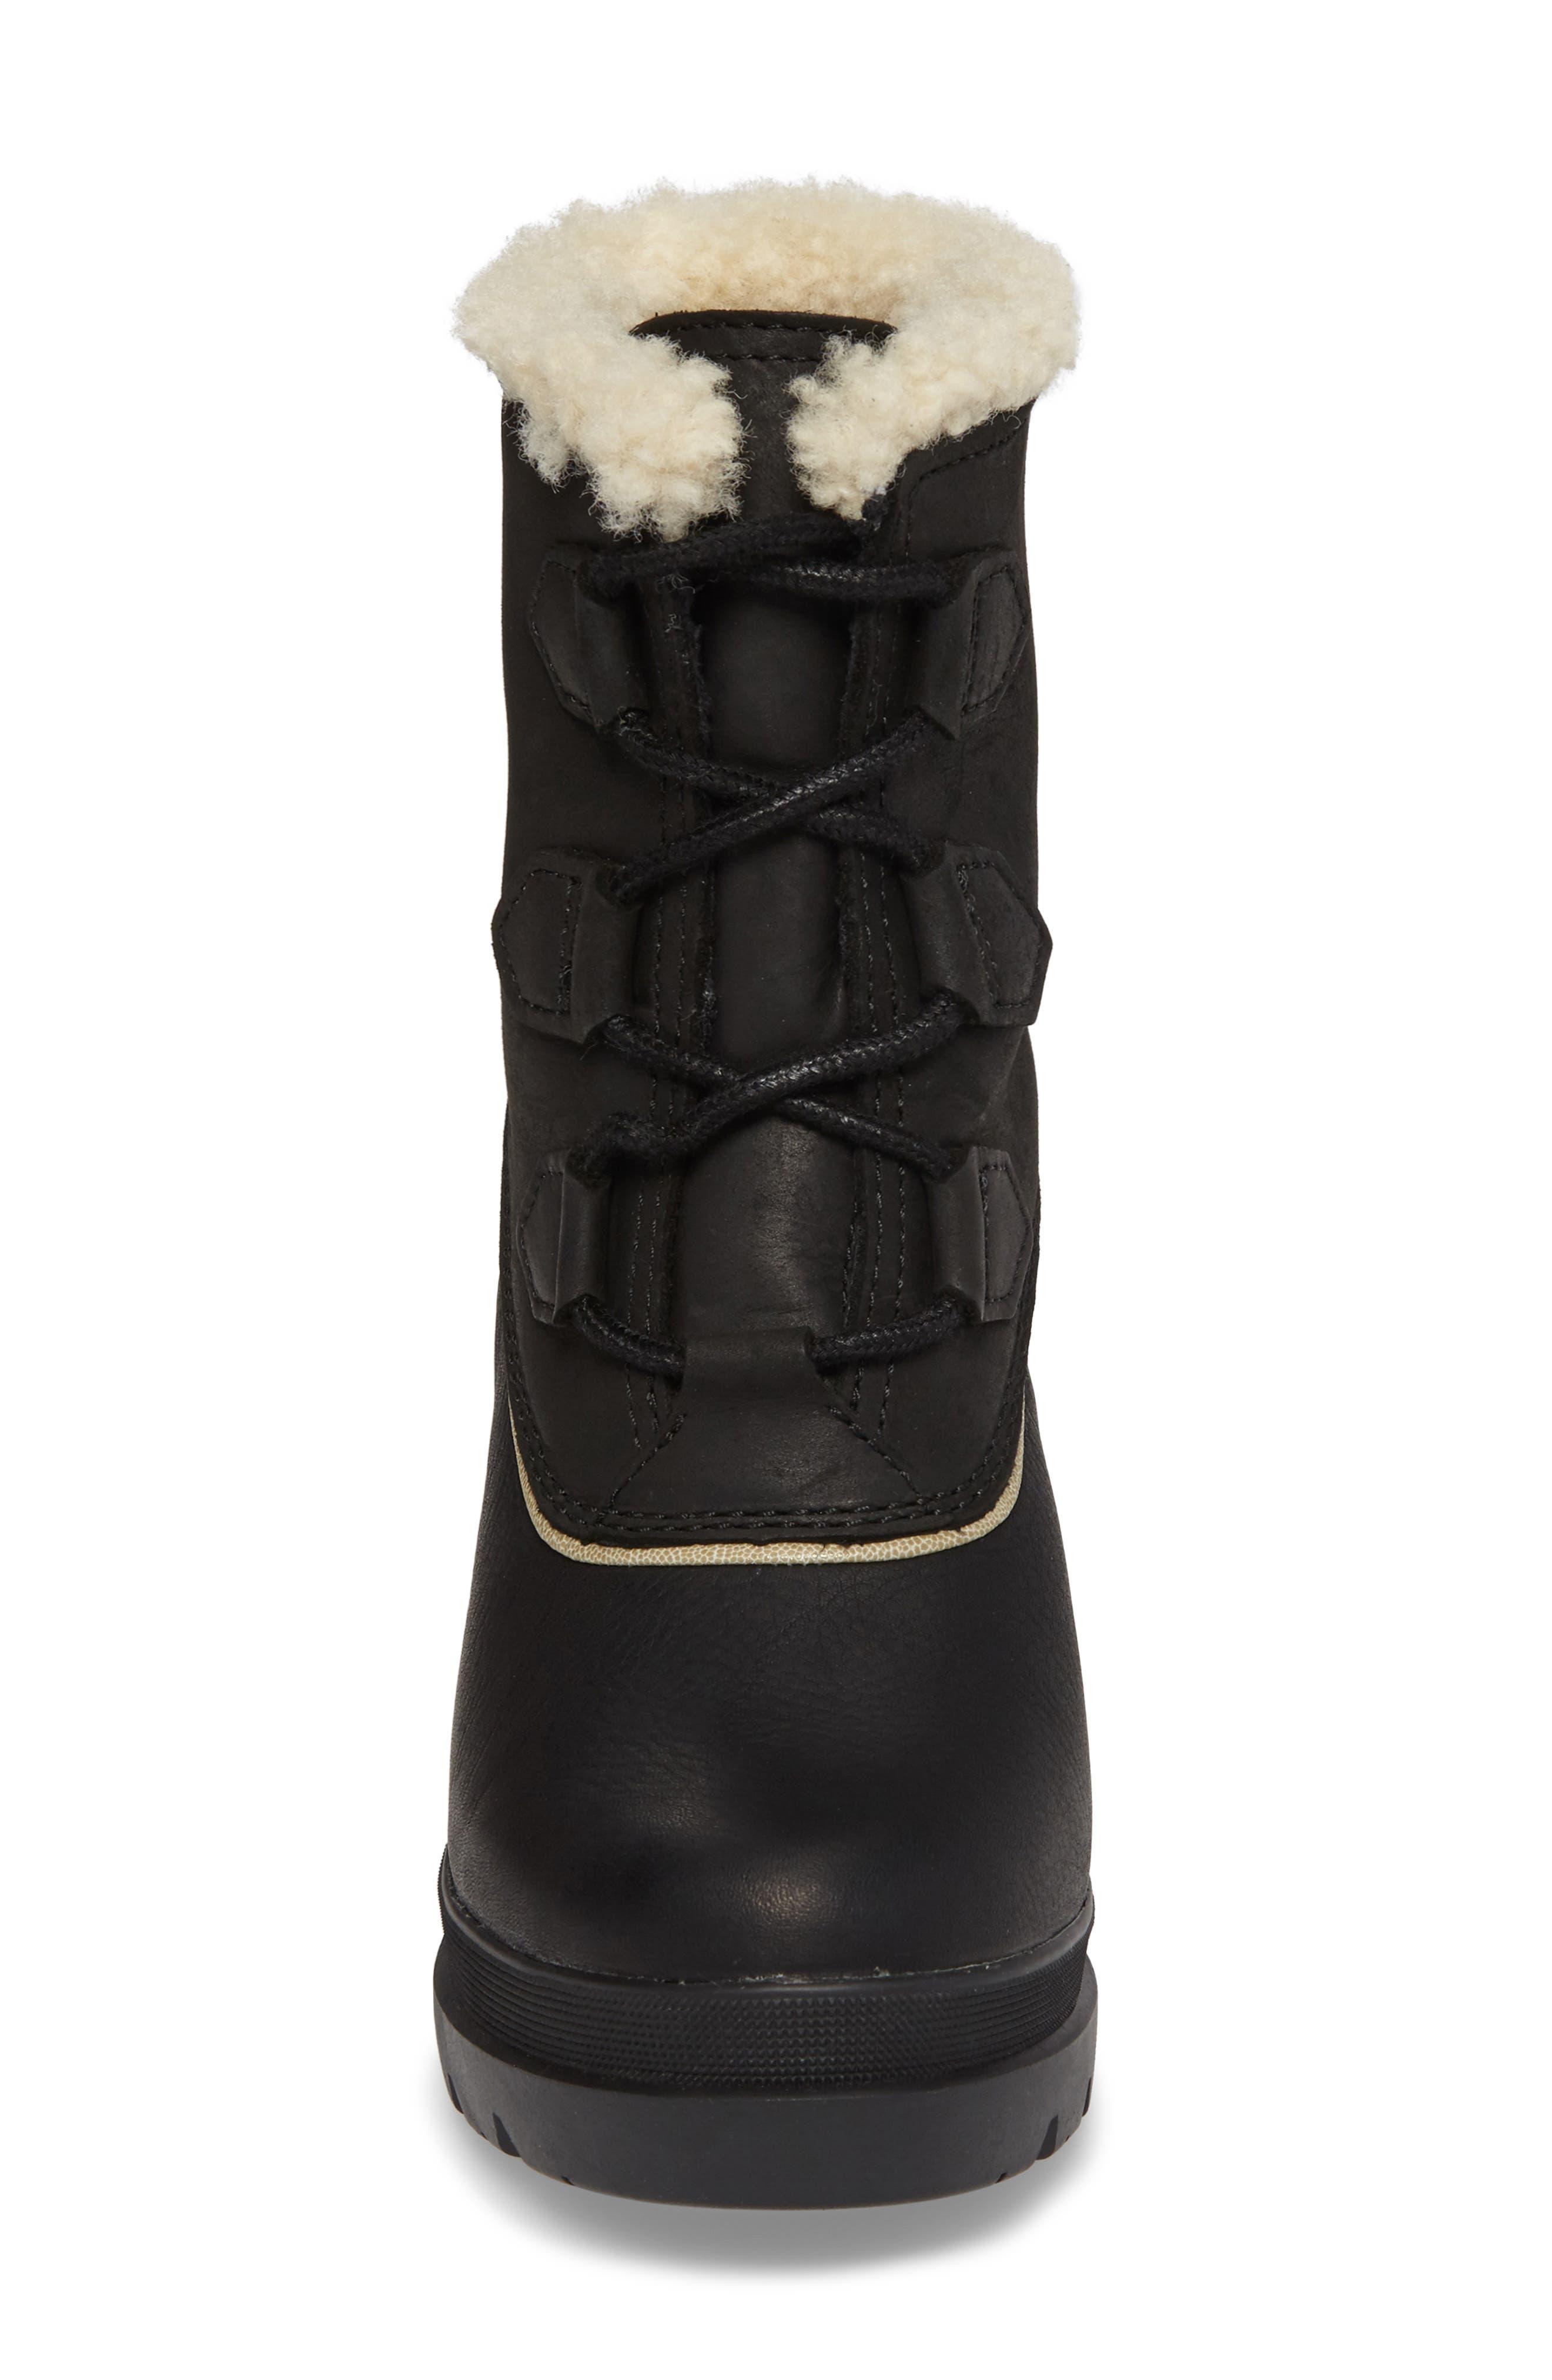 SOREL,                             Dacie Genuine Shearling Cuff Waterproof Boot,                             Alternate thumbnail 4, color,                             010